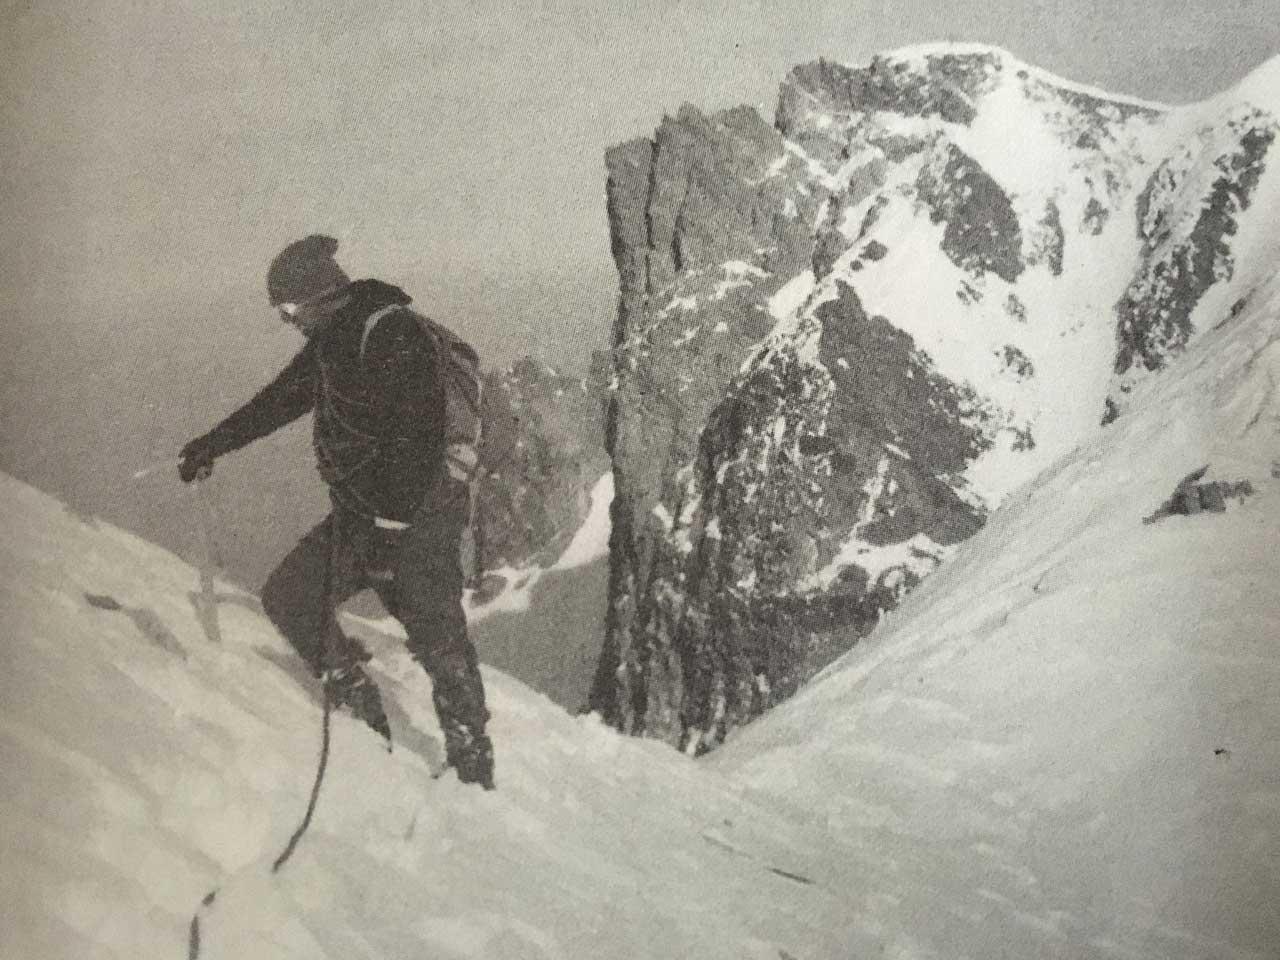 Erciyes dağı 1967 tırmanışı